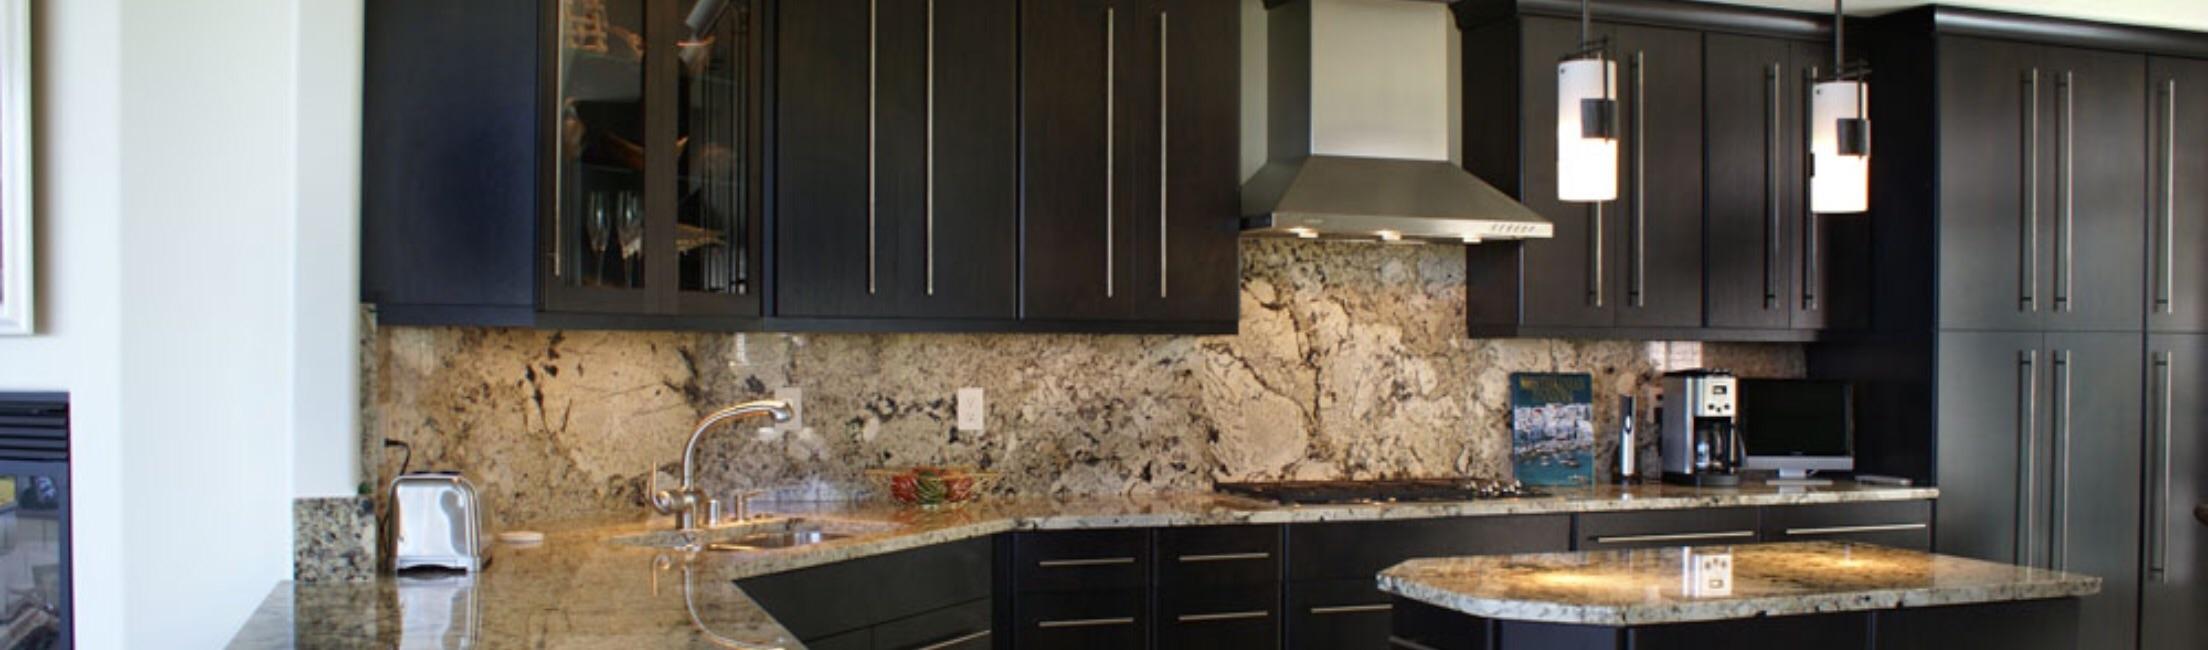 Magnus Granite Llc In Roanoke Va Whitepages